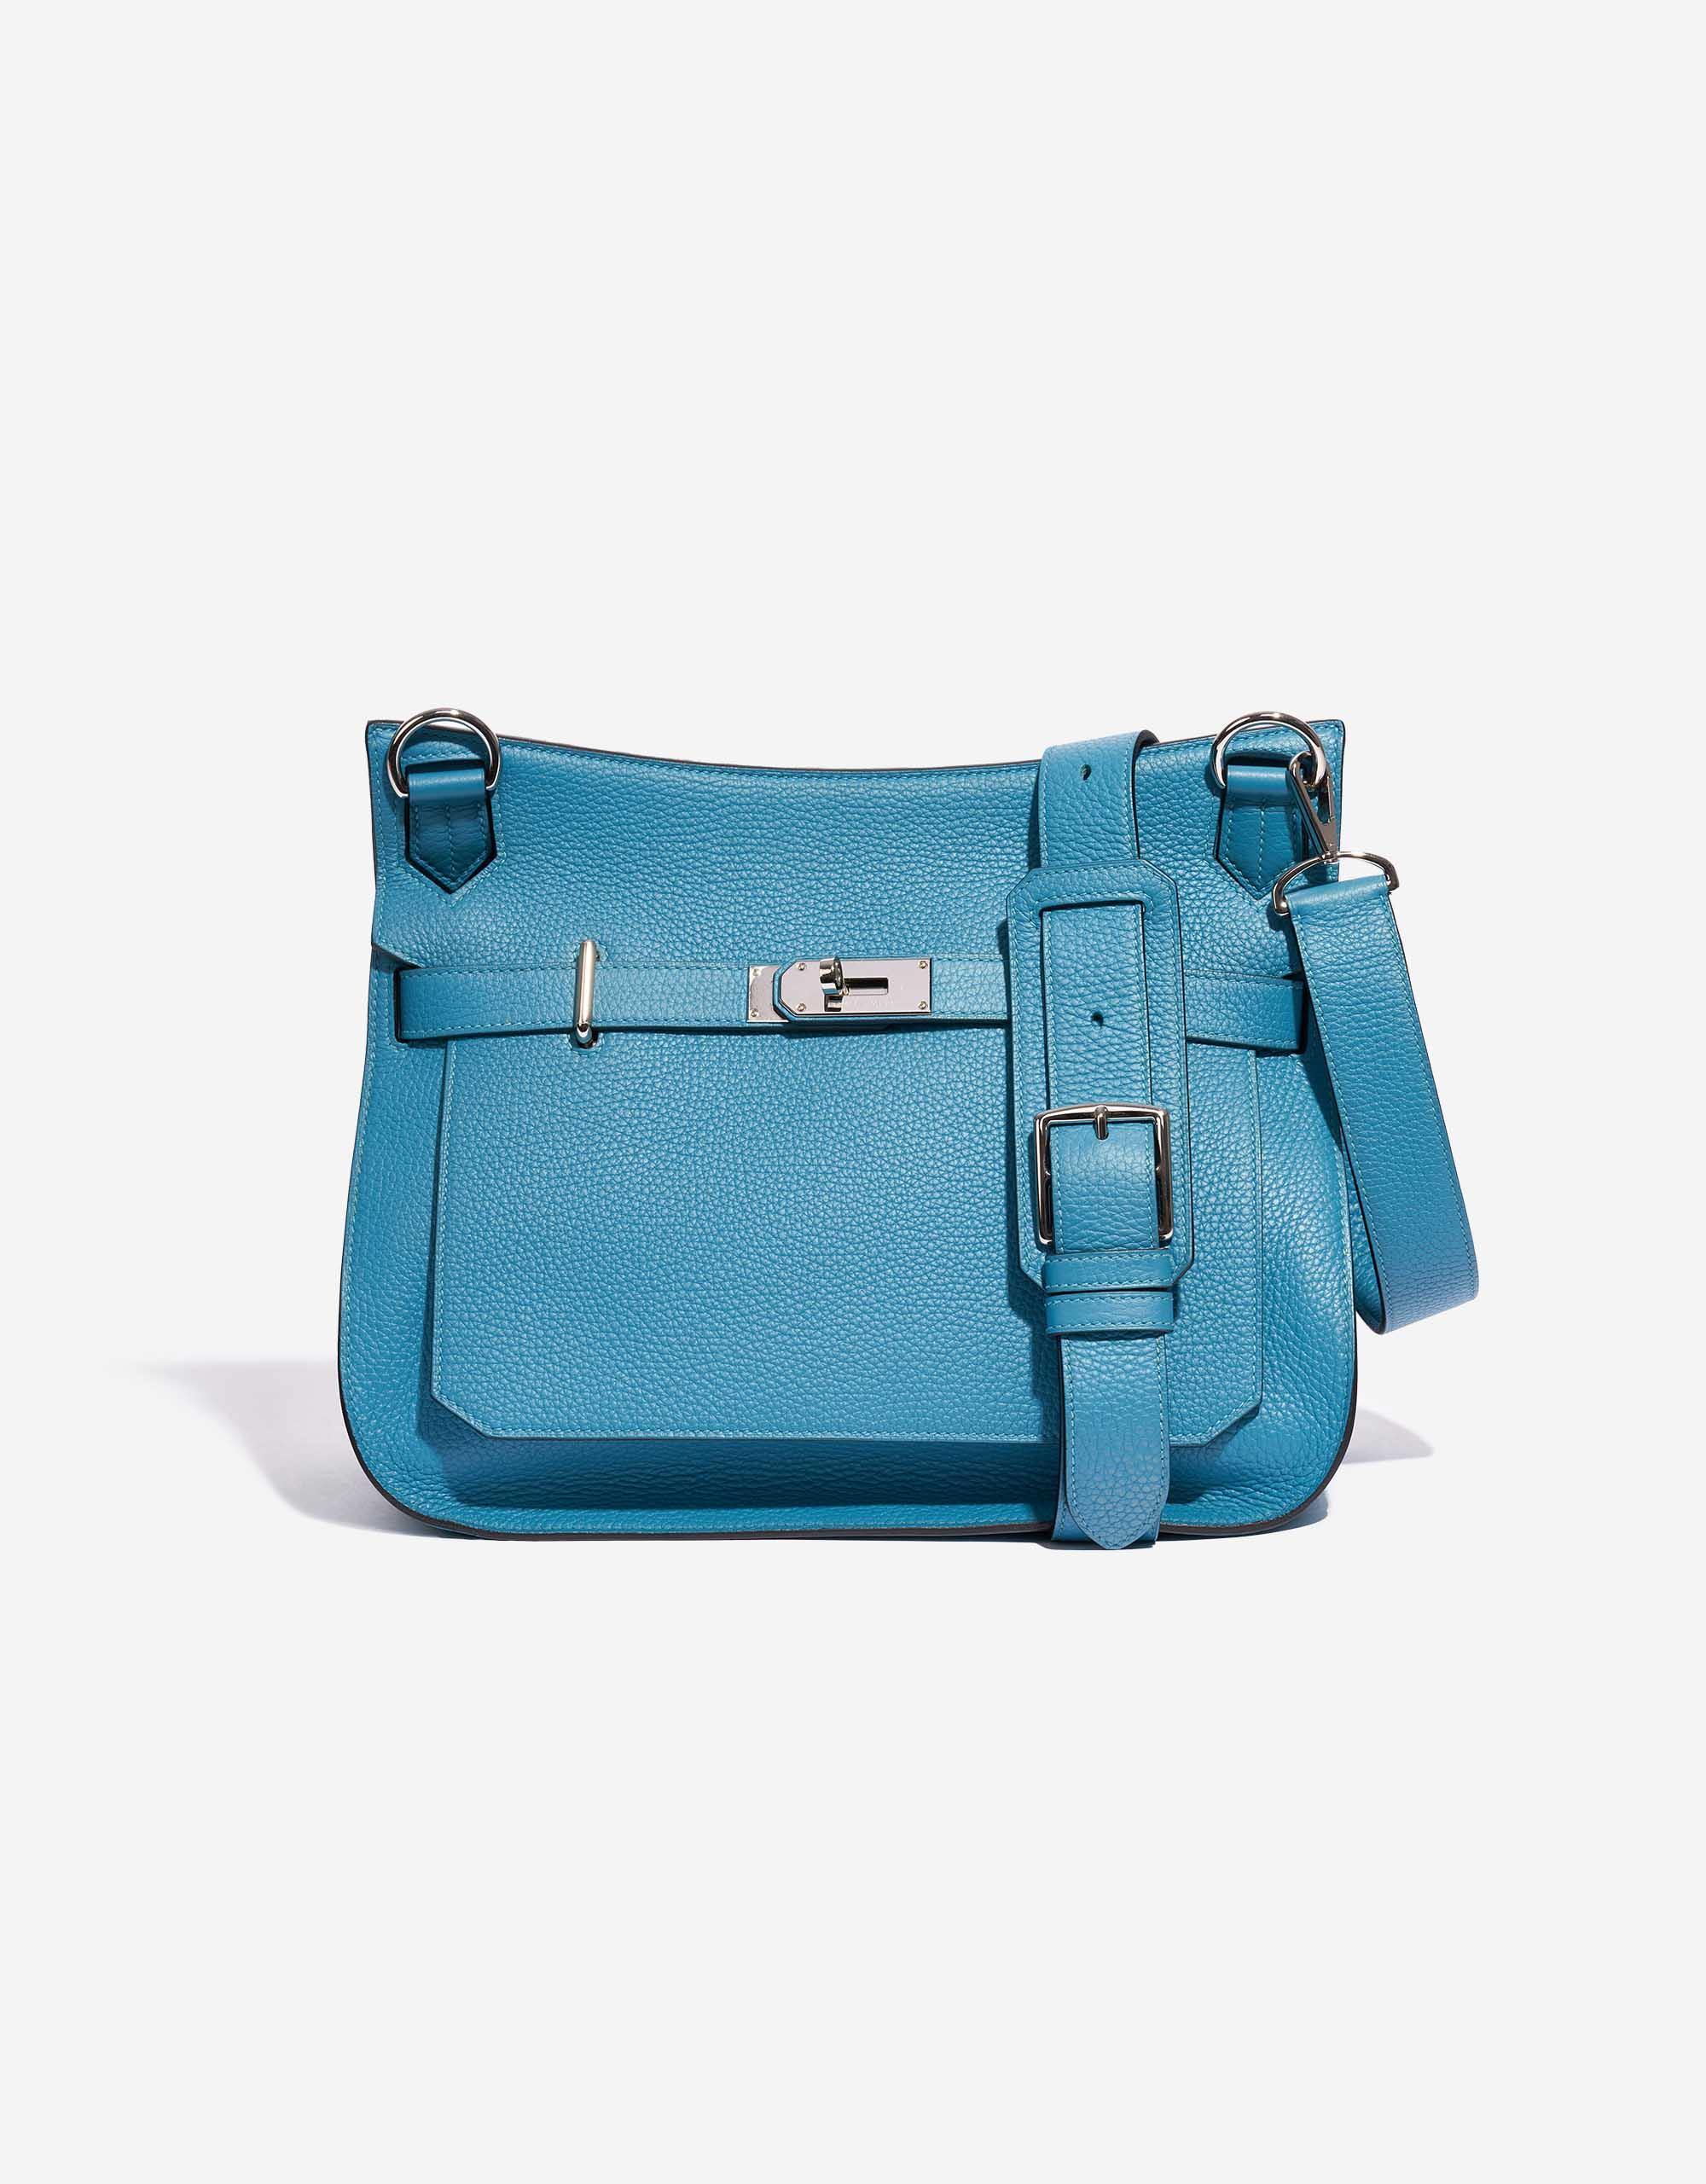 Hermès Jypsiere 34 Taurillon Clemence Turquoise | SACLÀB